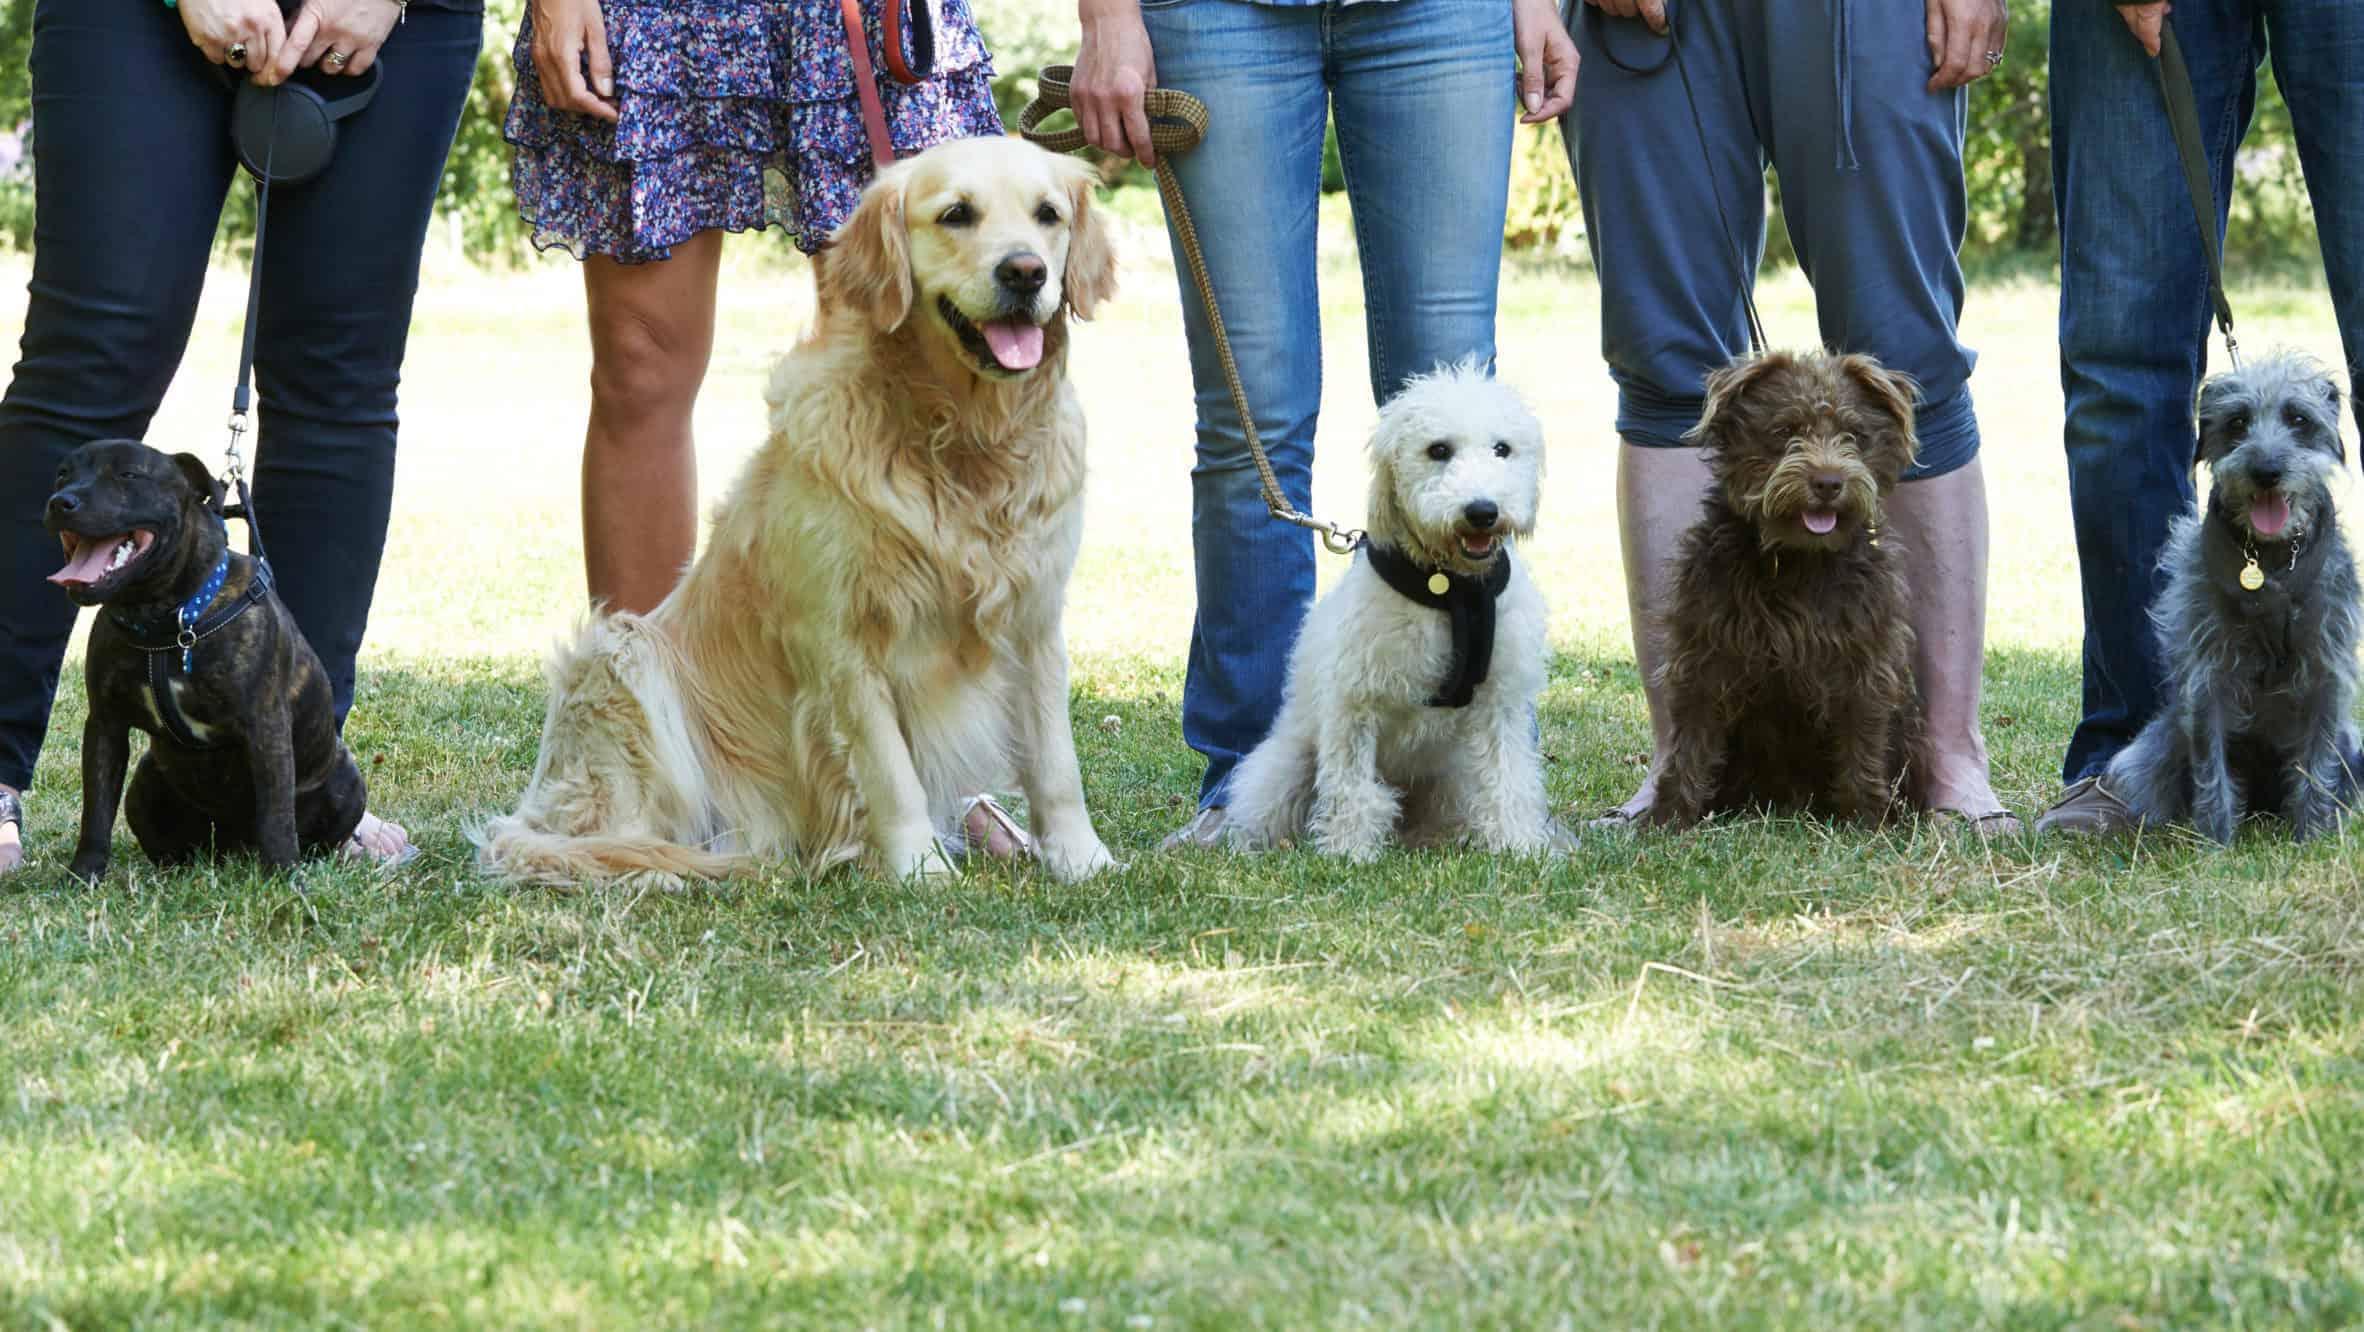 Dog Park at Wappo Park